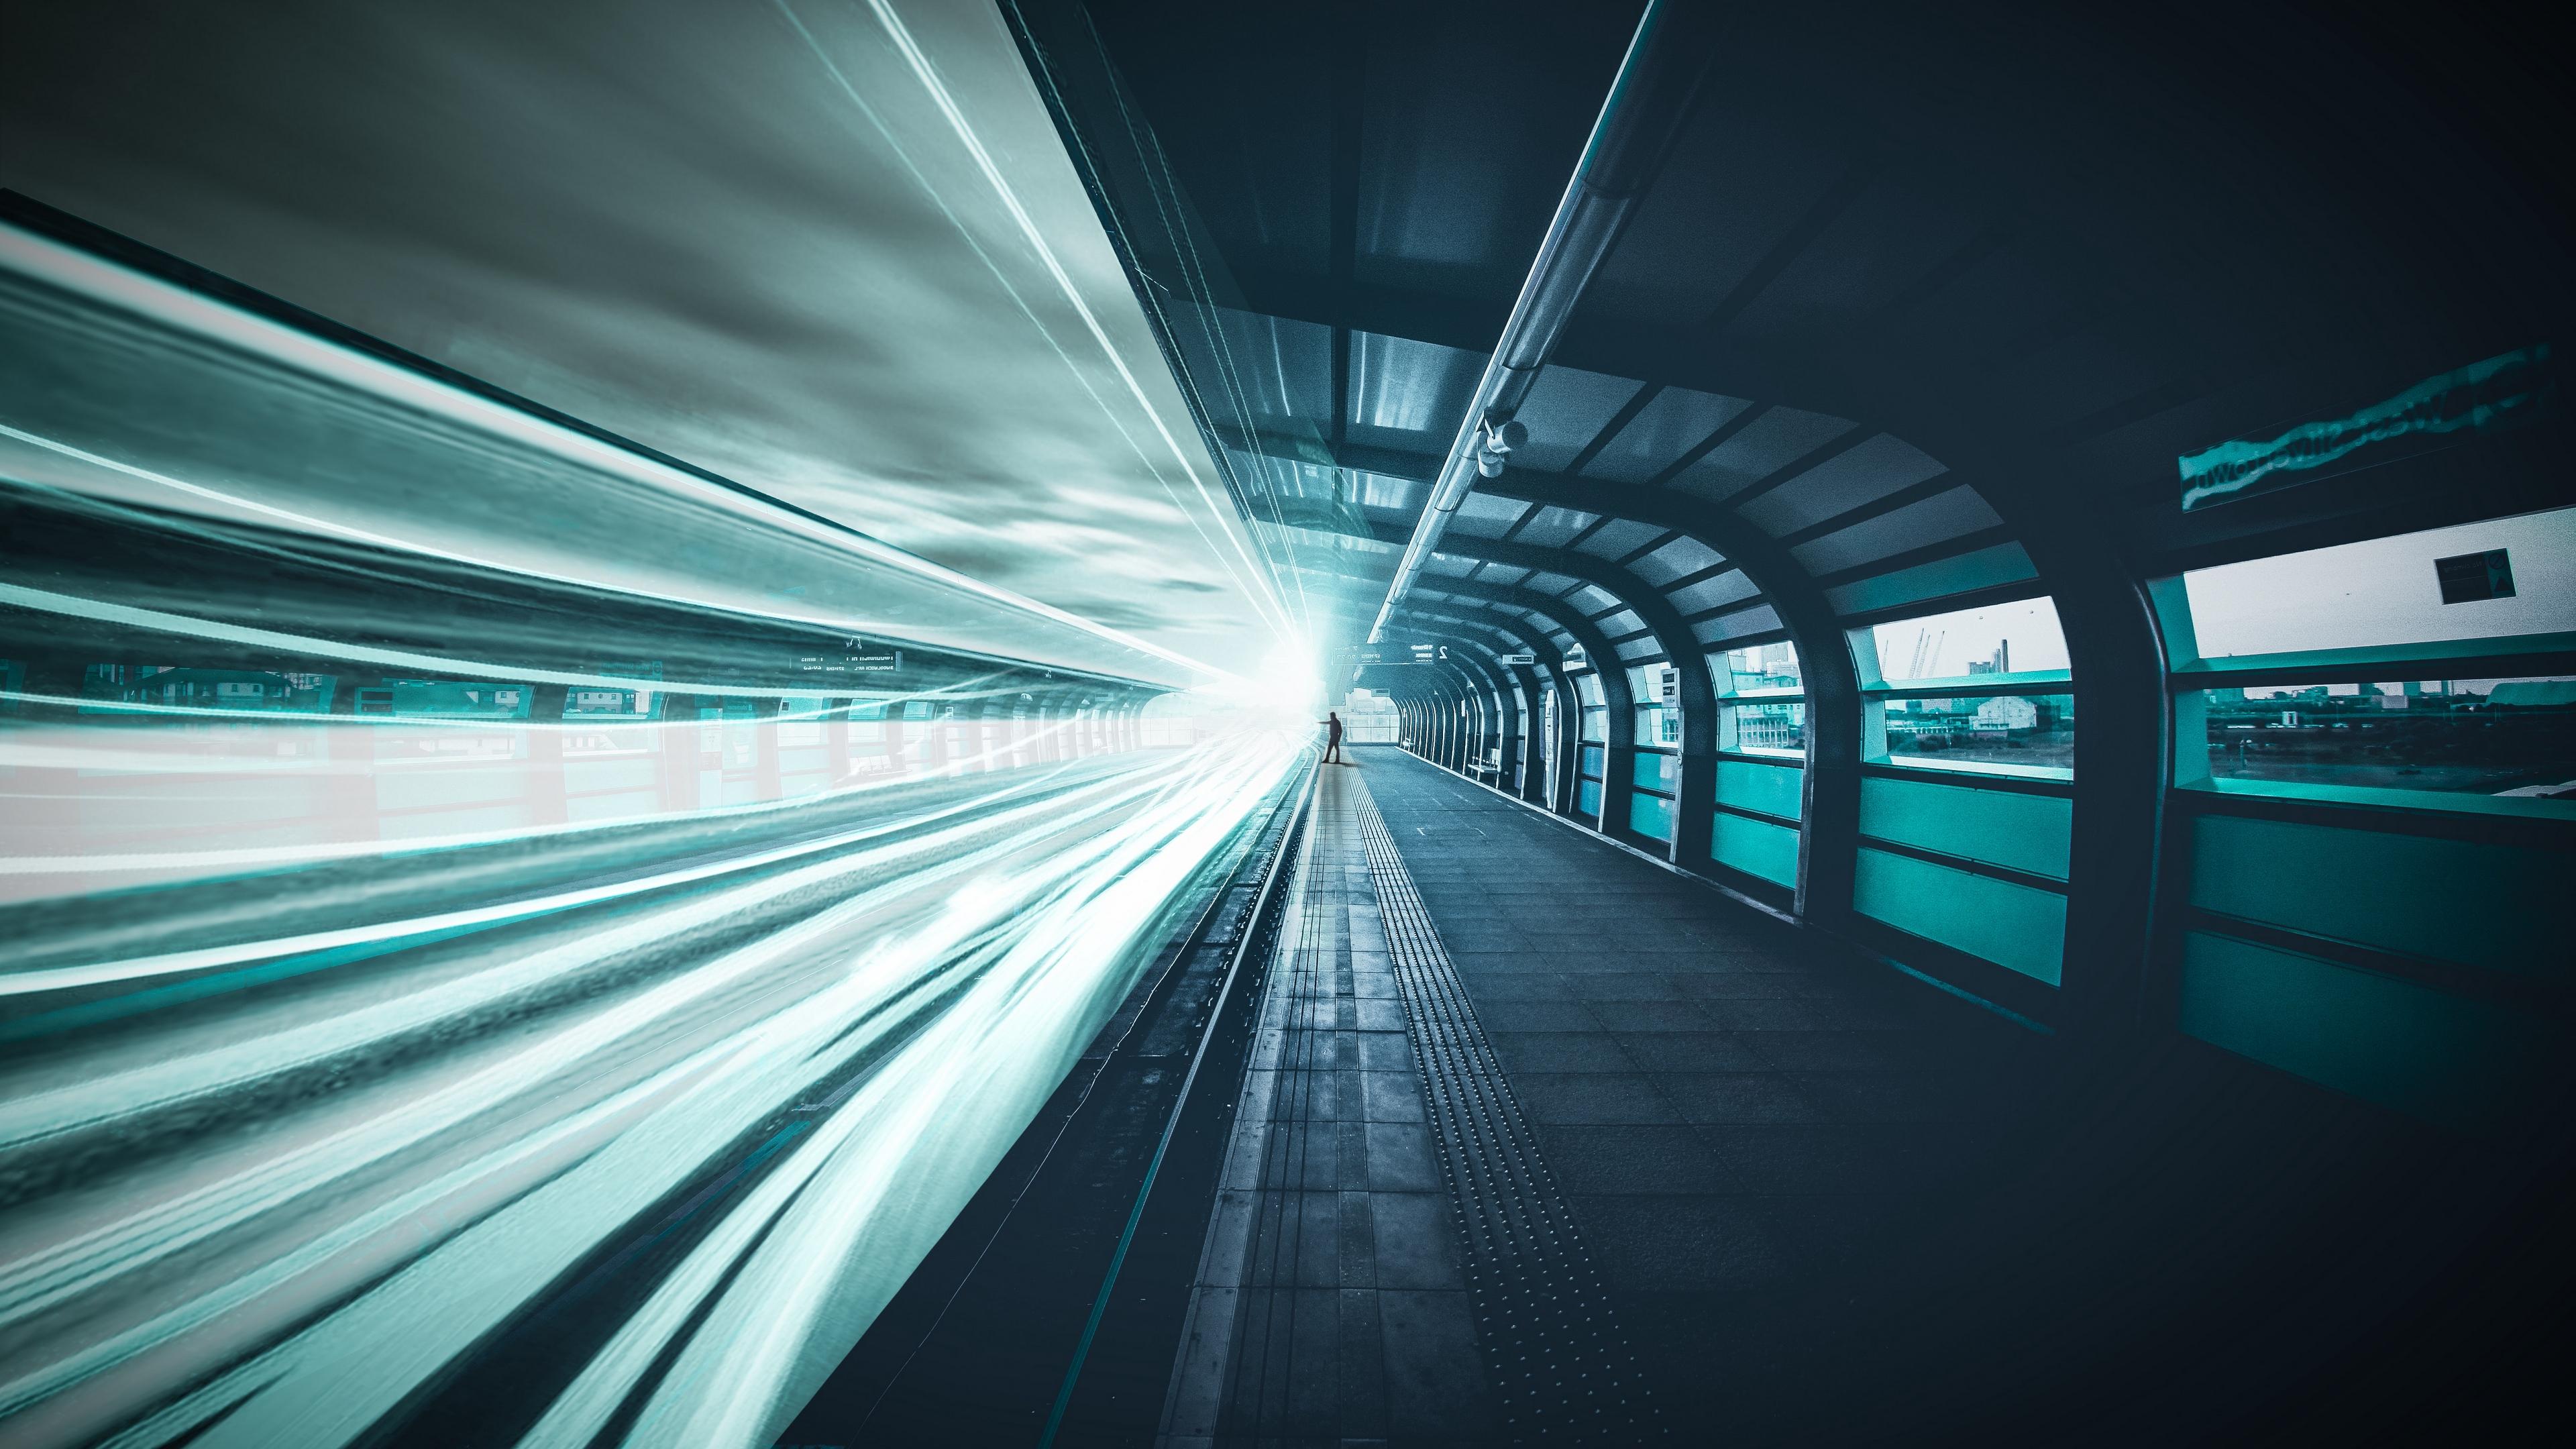 railroad underground man line light 4k 1538068877 - railroad, underground, man, line, light 4k - underground, railroad, Man